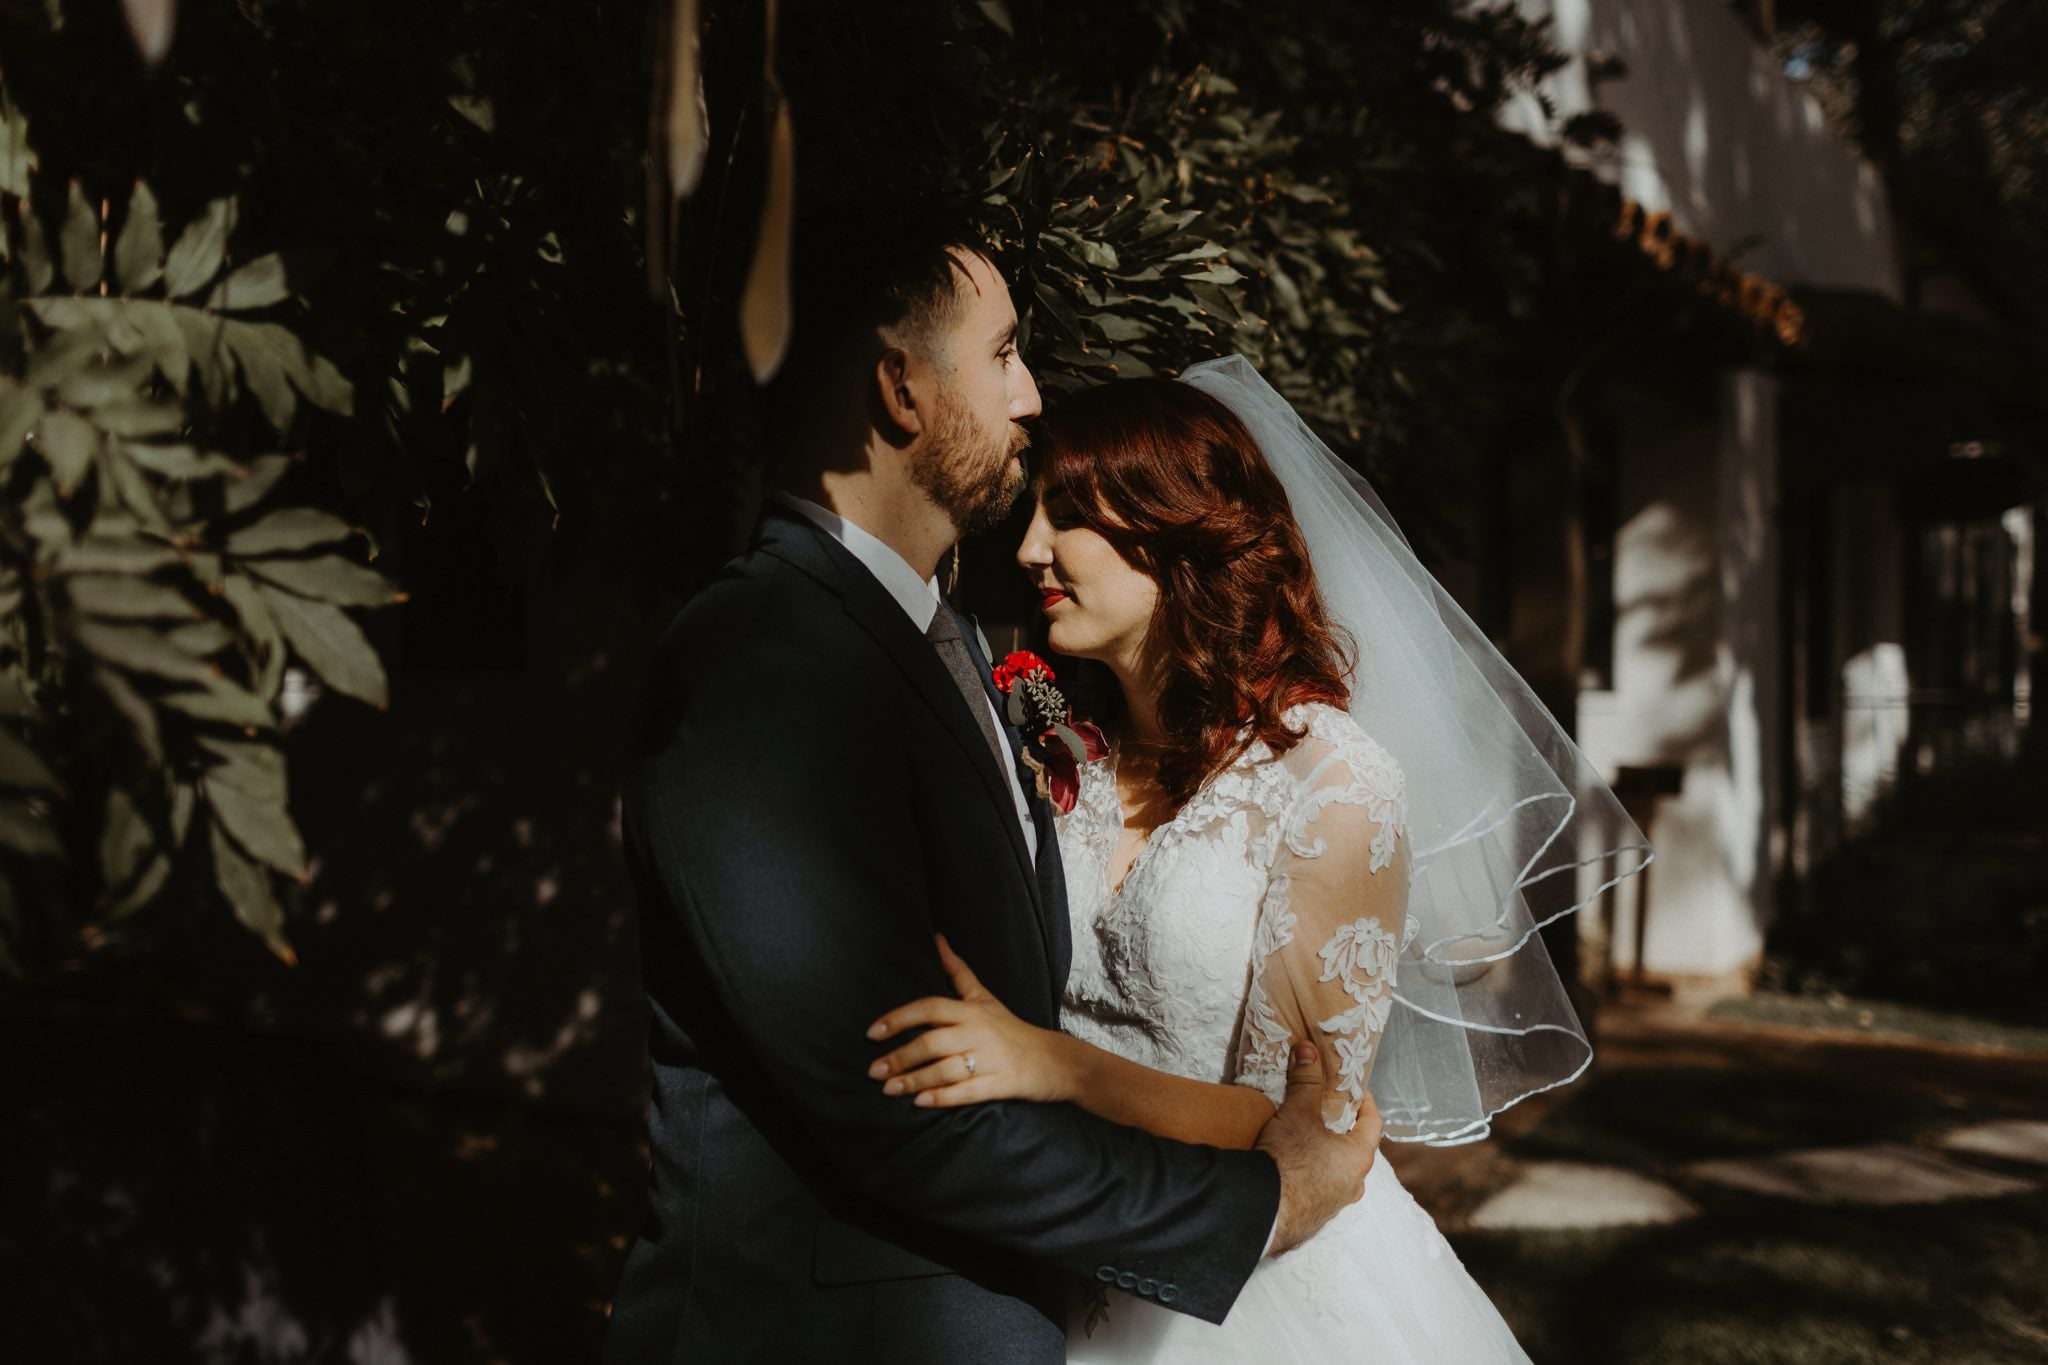 simi valley wedding photography 058